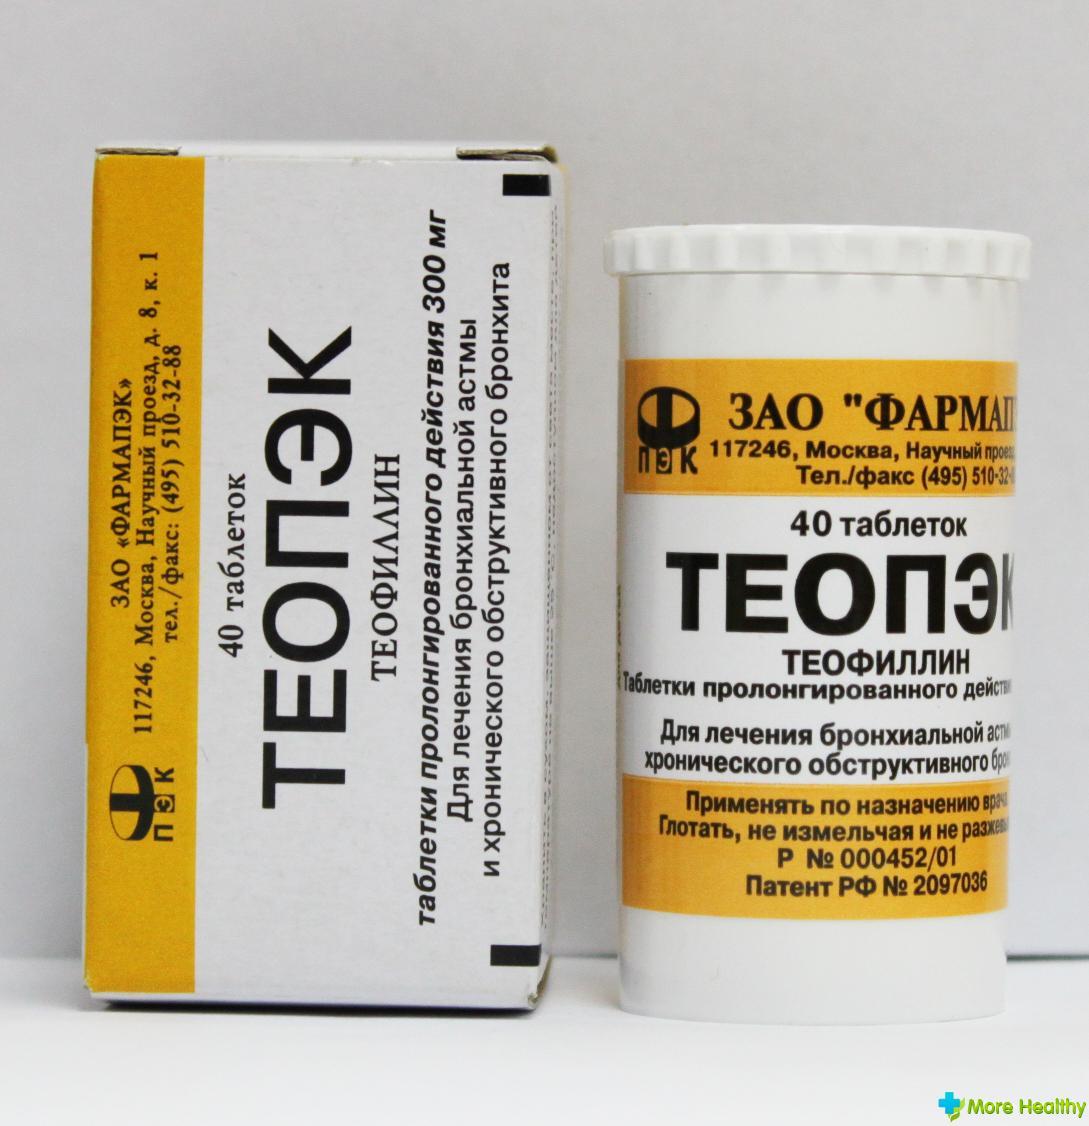 таблетки от астмы теопэк